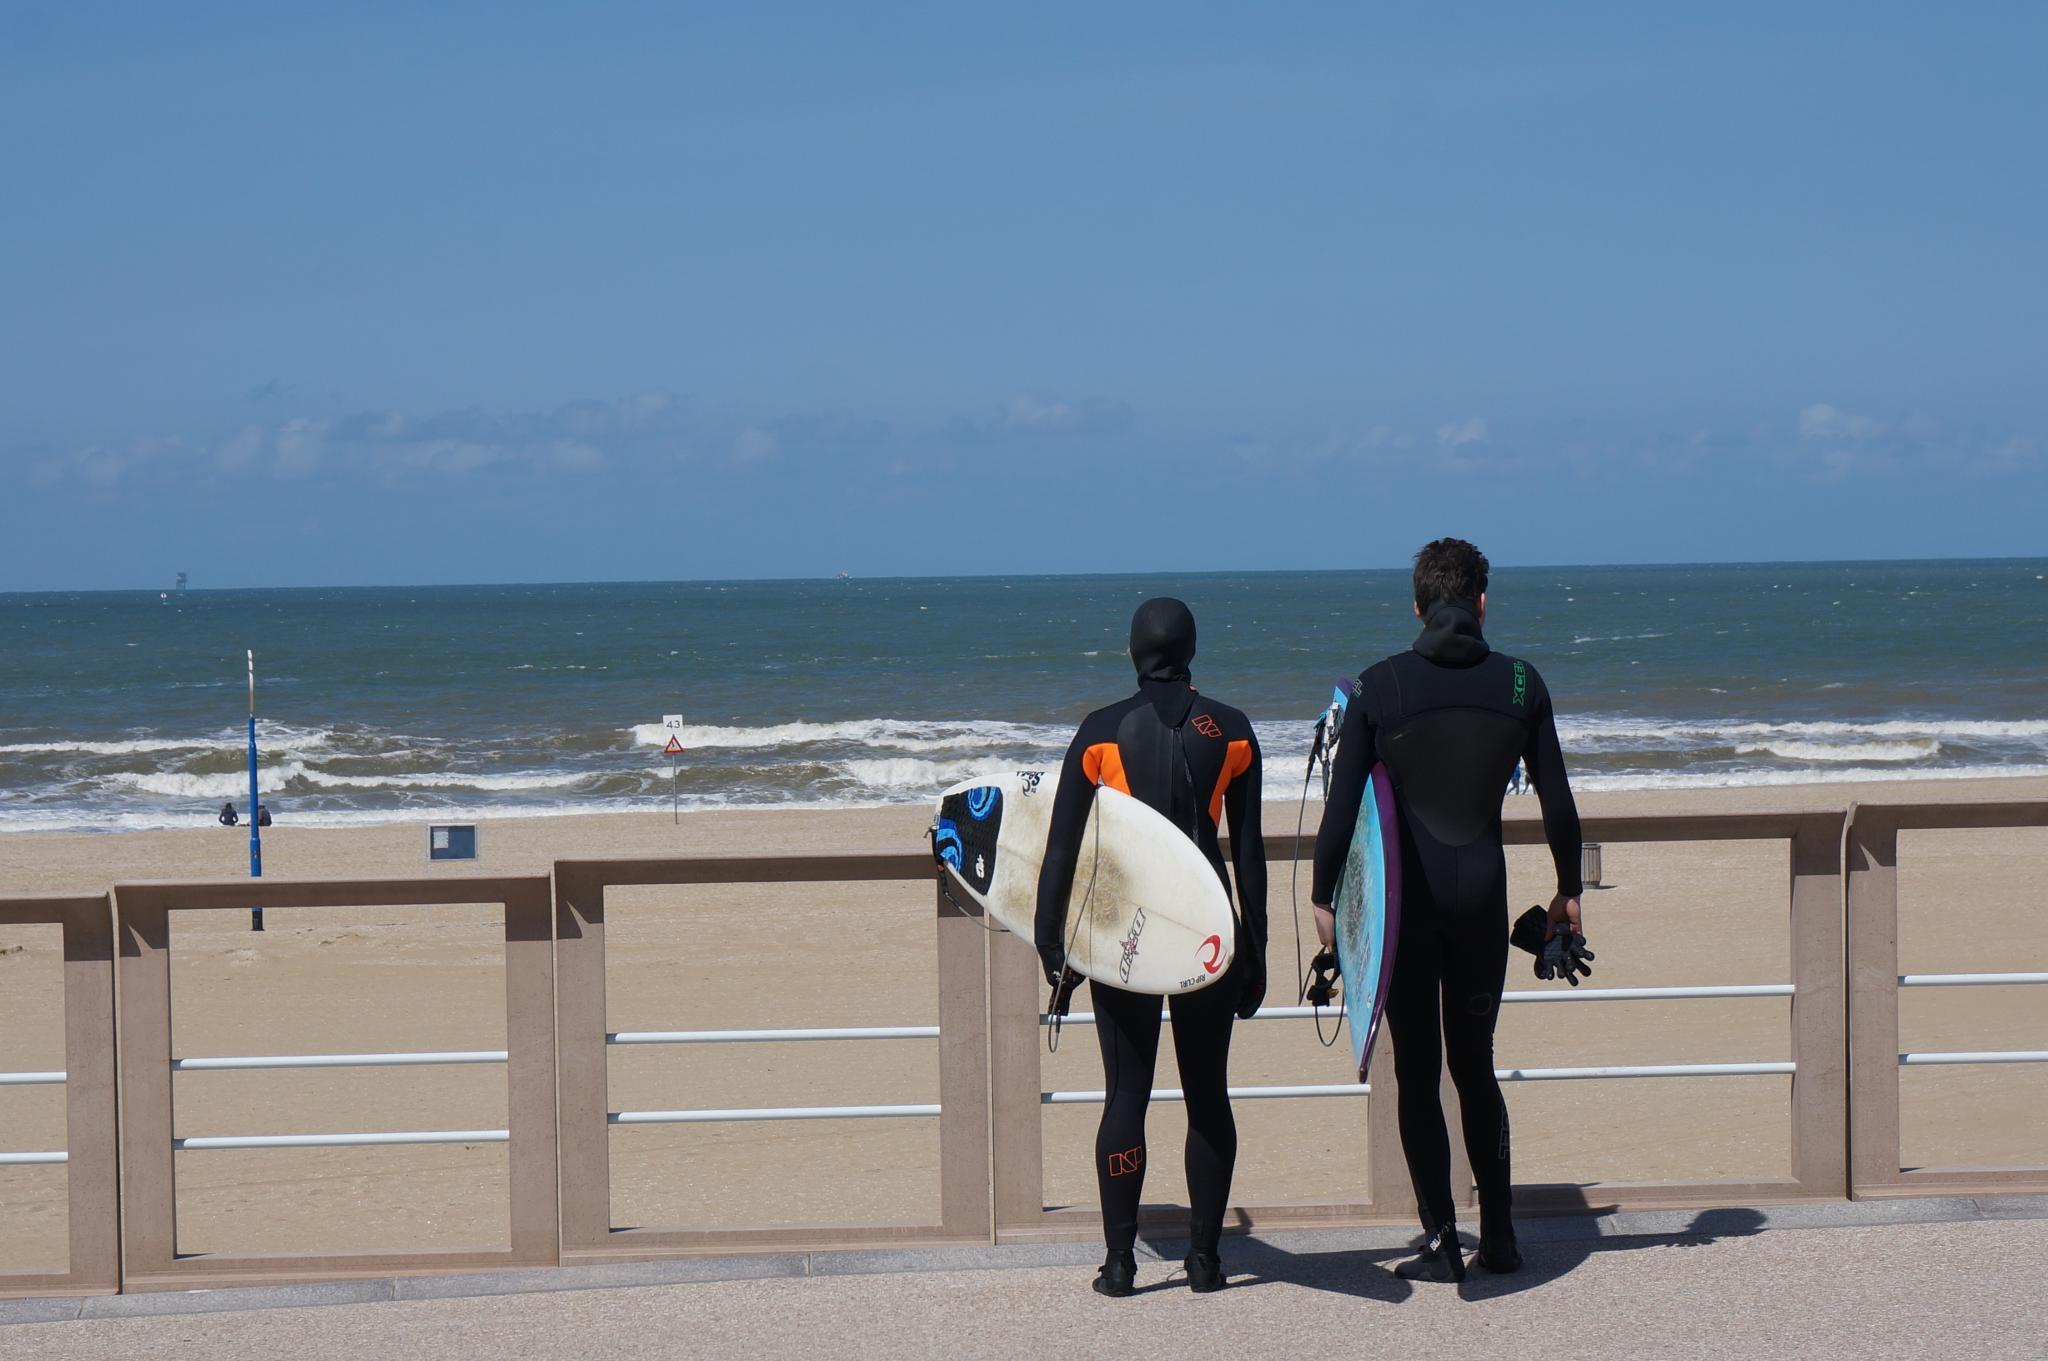 Surfers by MichaelGentis